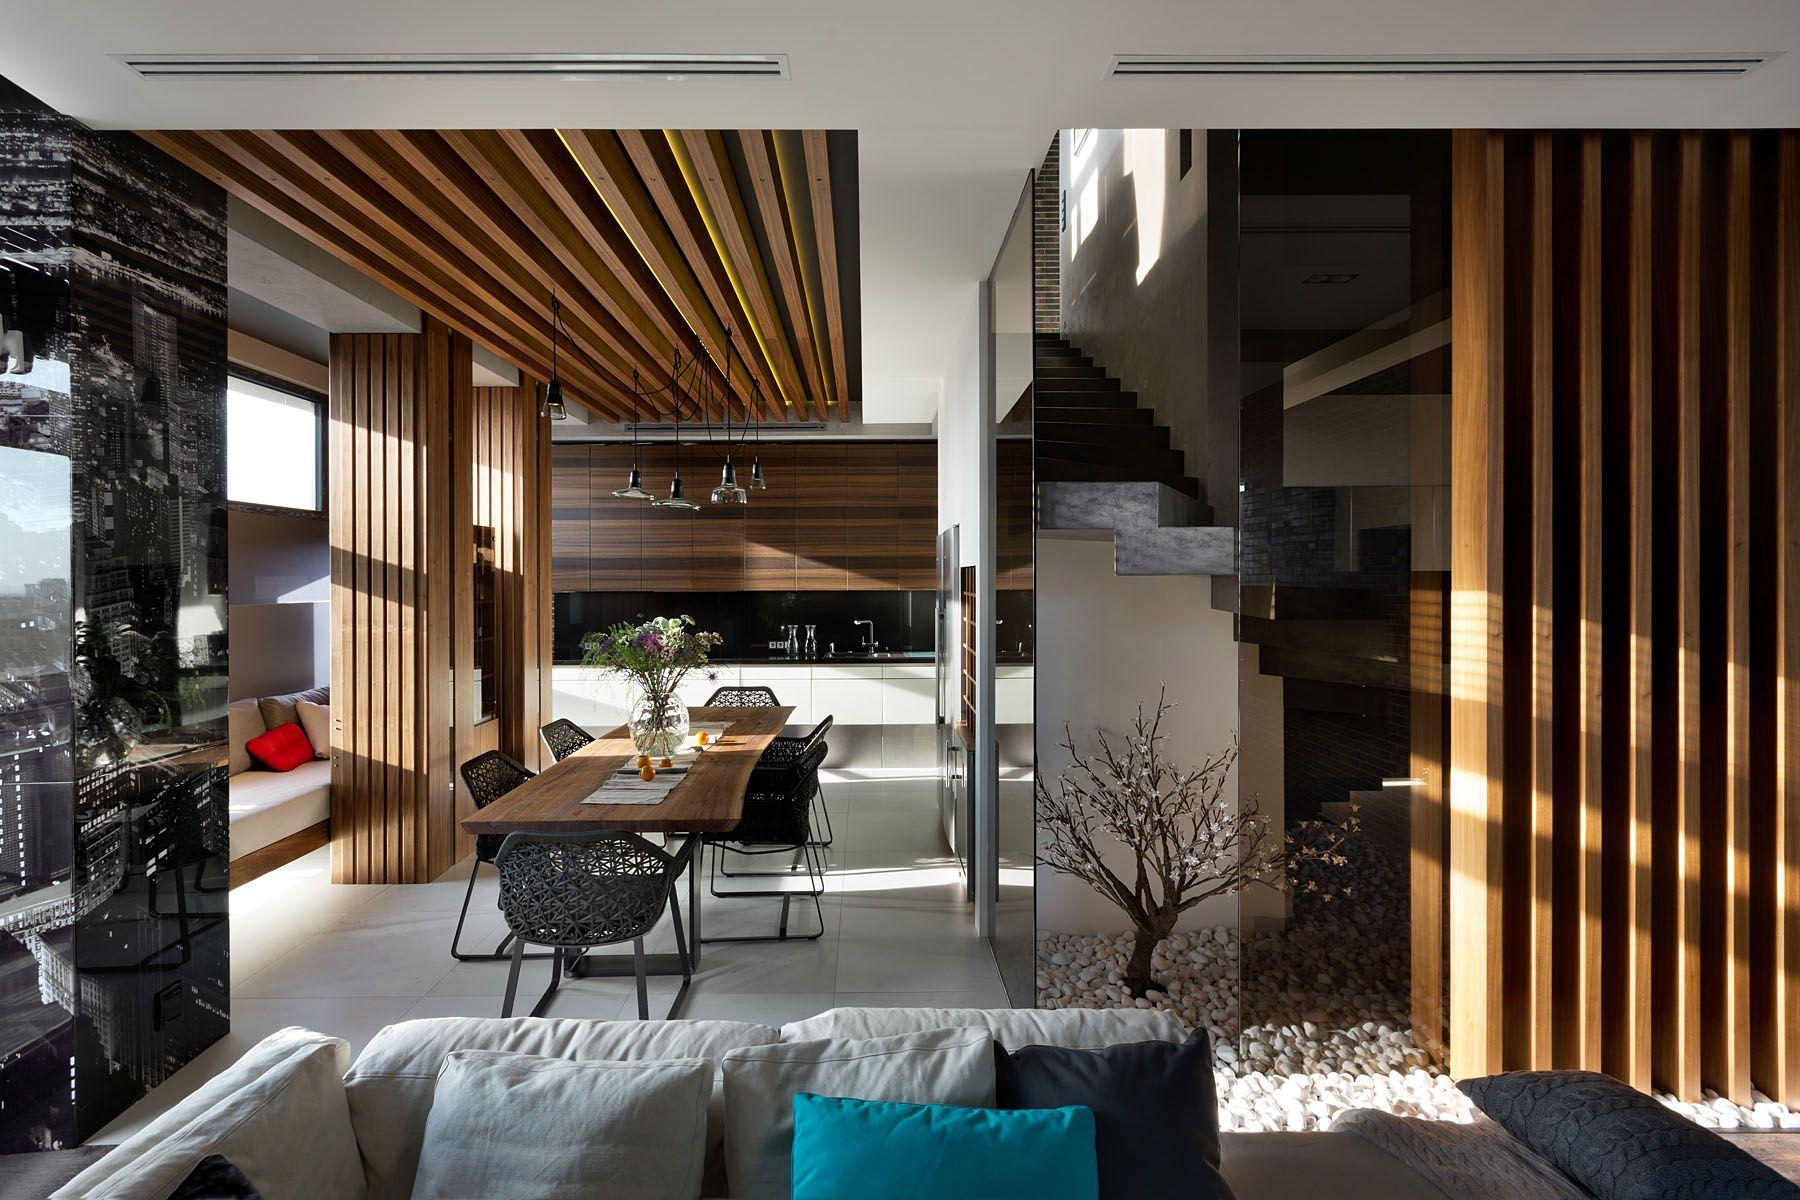 Find us on facebook modern interiors ua living spaces modern home design